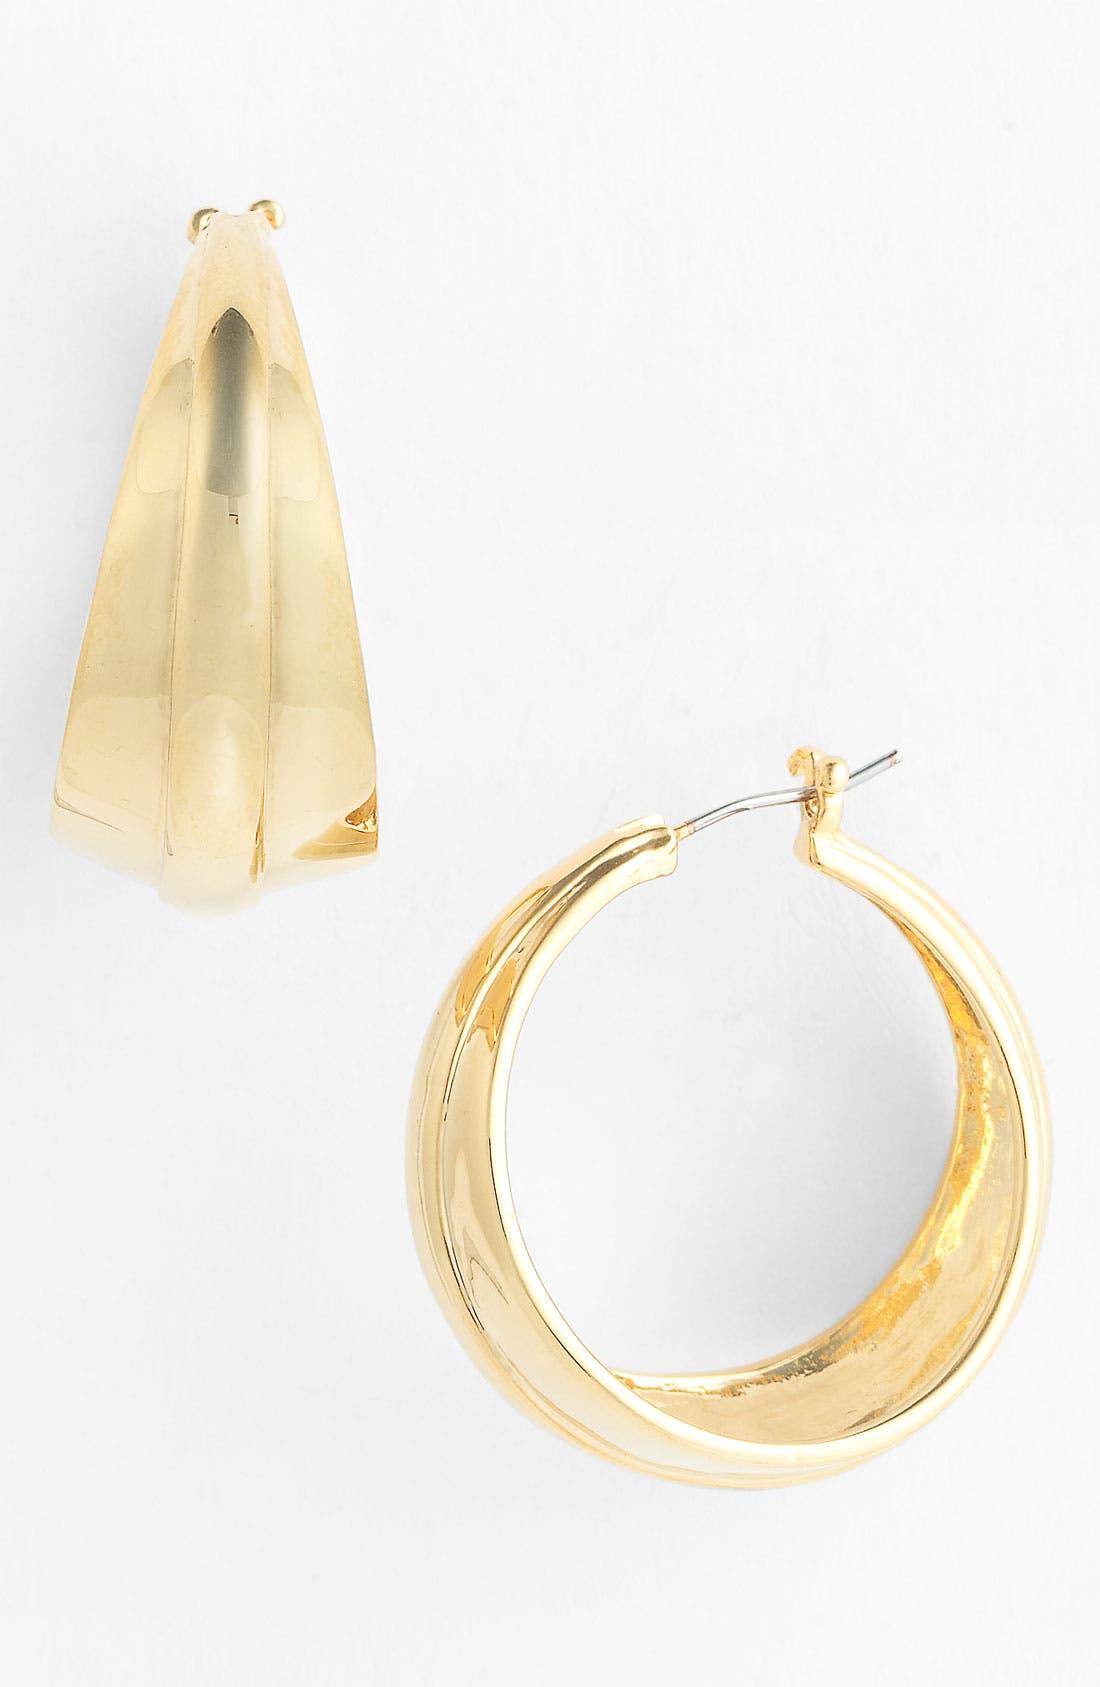 Main Image - Vince Camuto 'Basics' Tapered Hoop Earrings